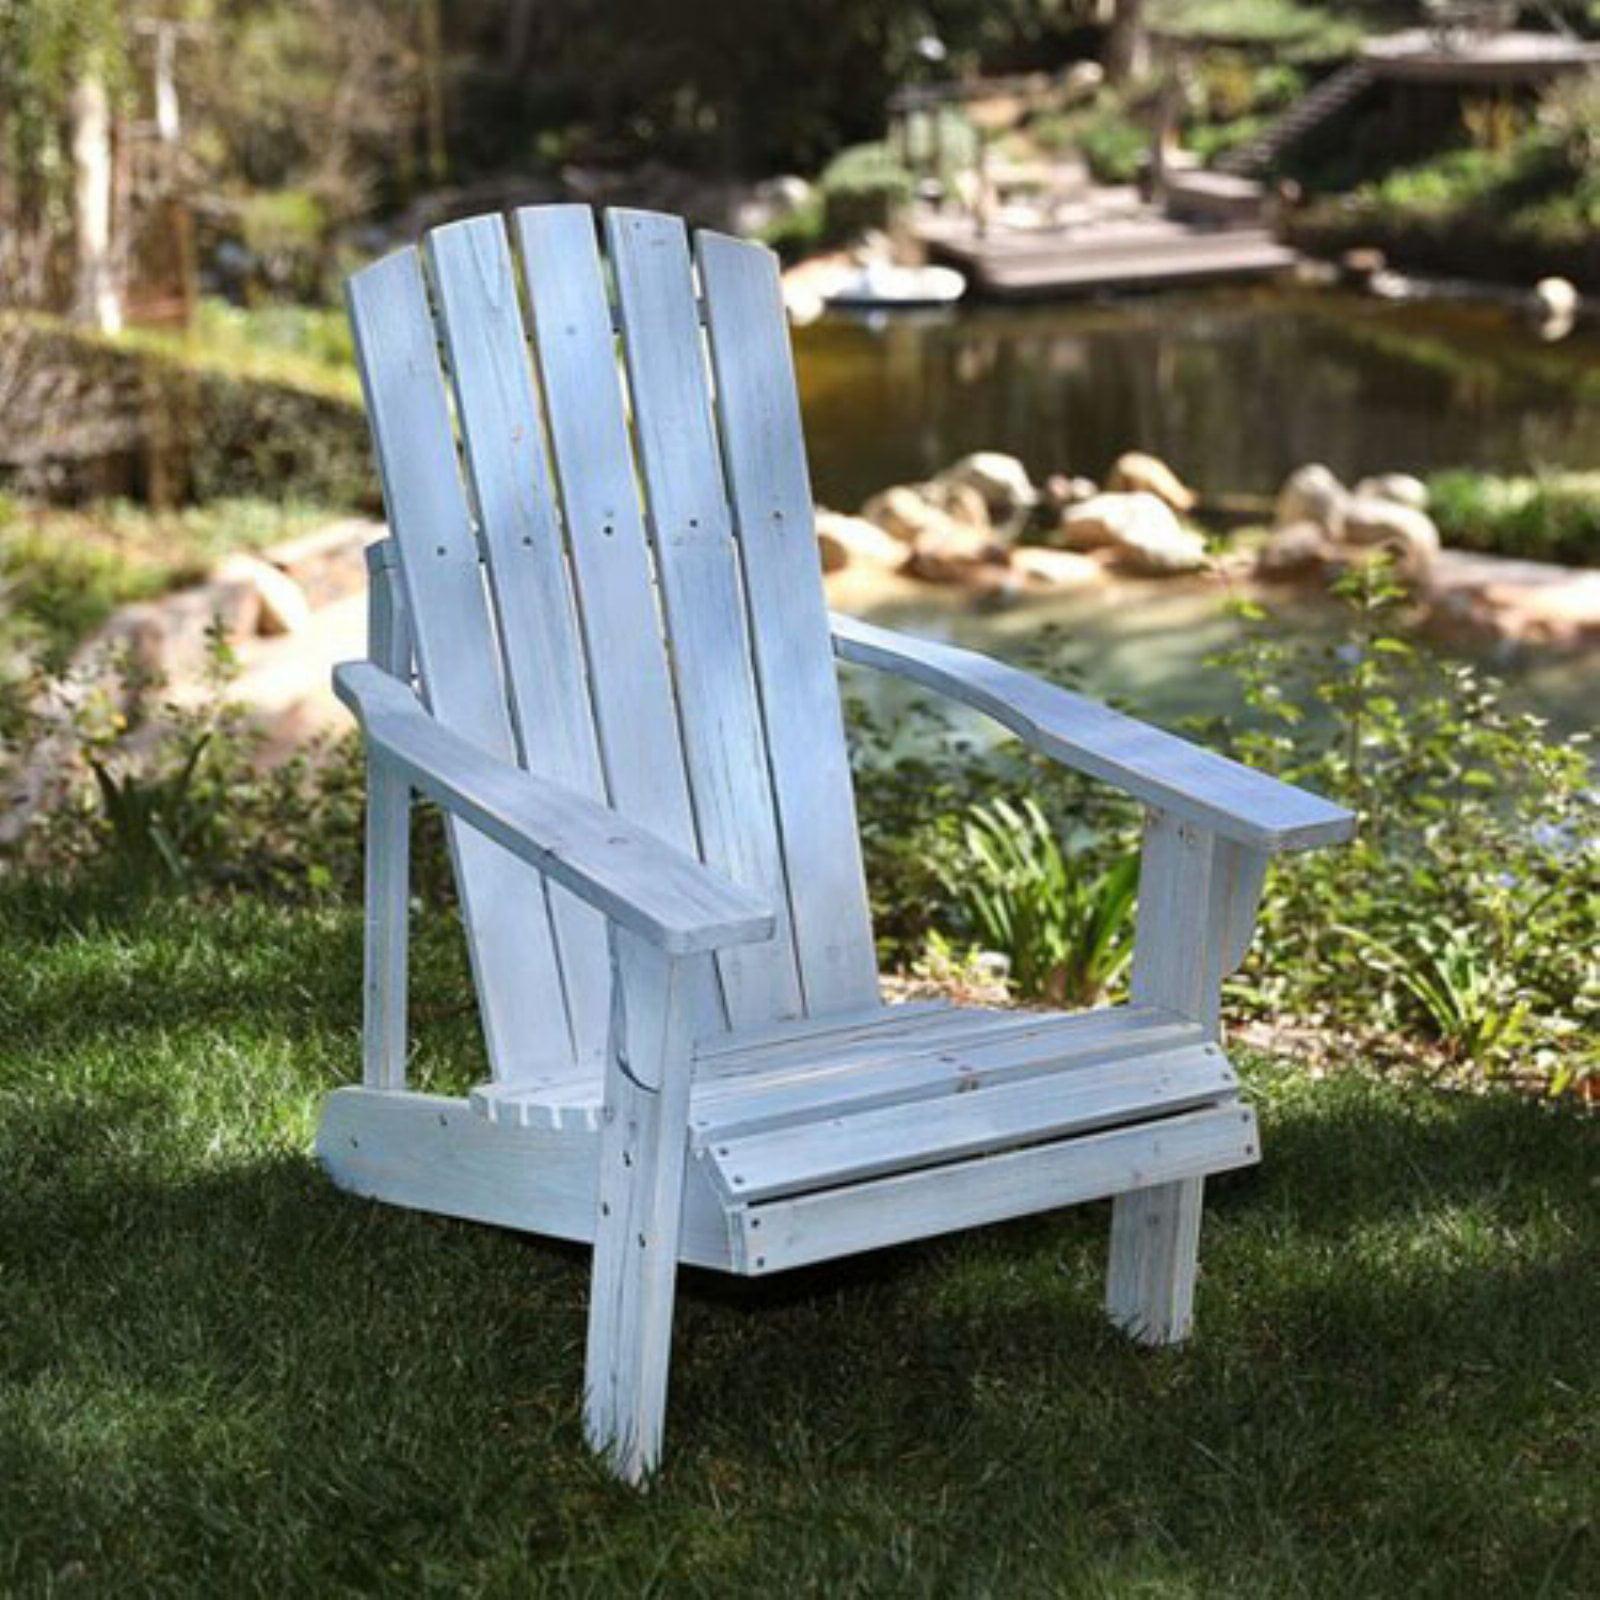 Lakewood Rustic Adirondack Chair Dutch Blue by Shine Company